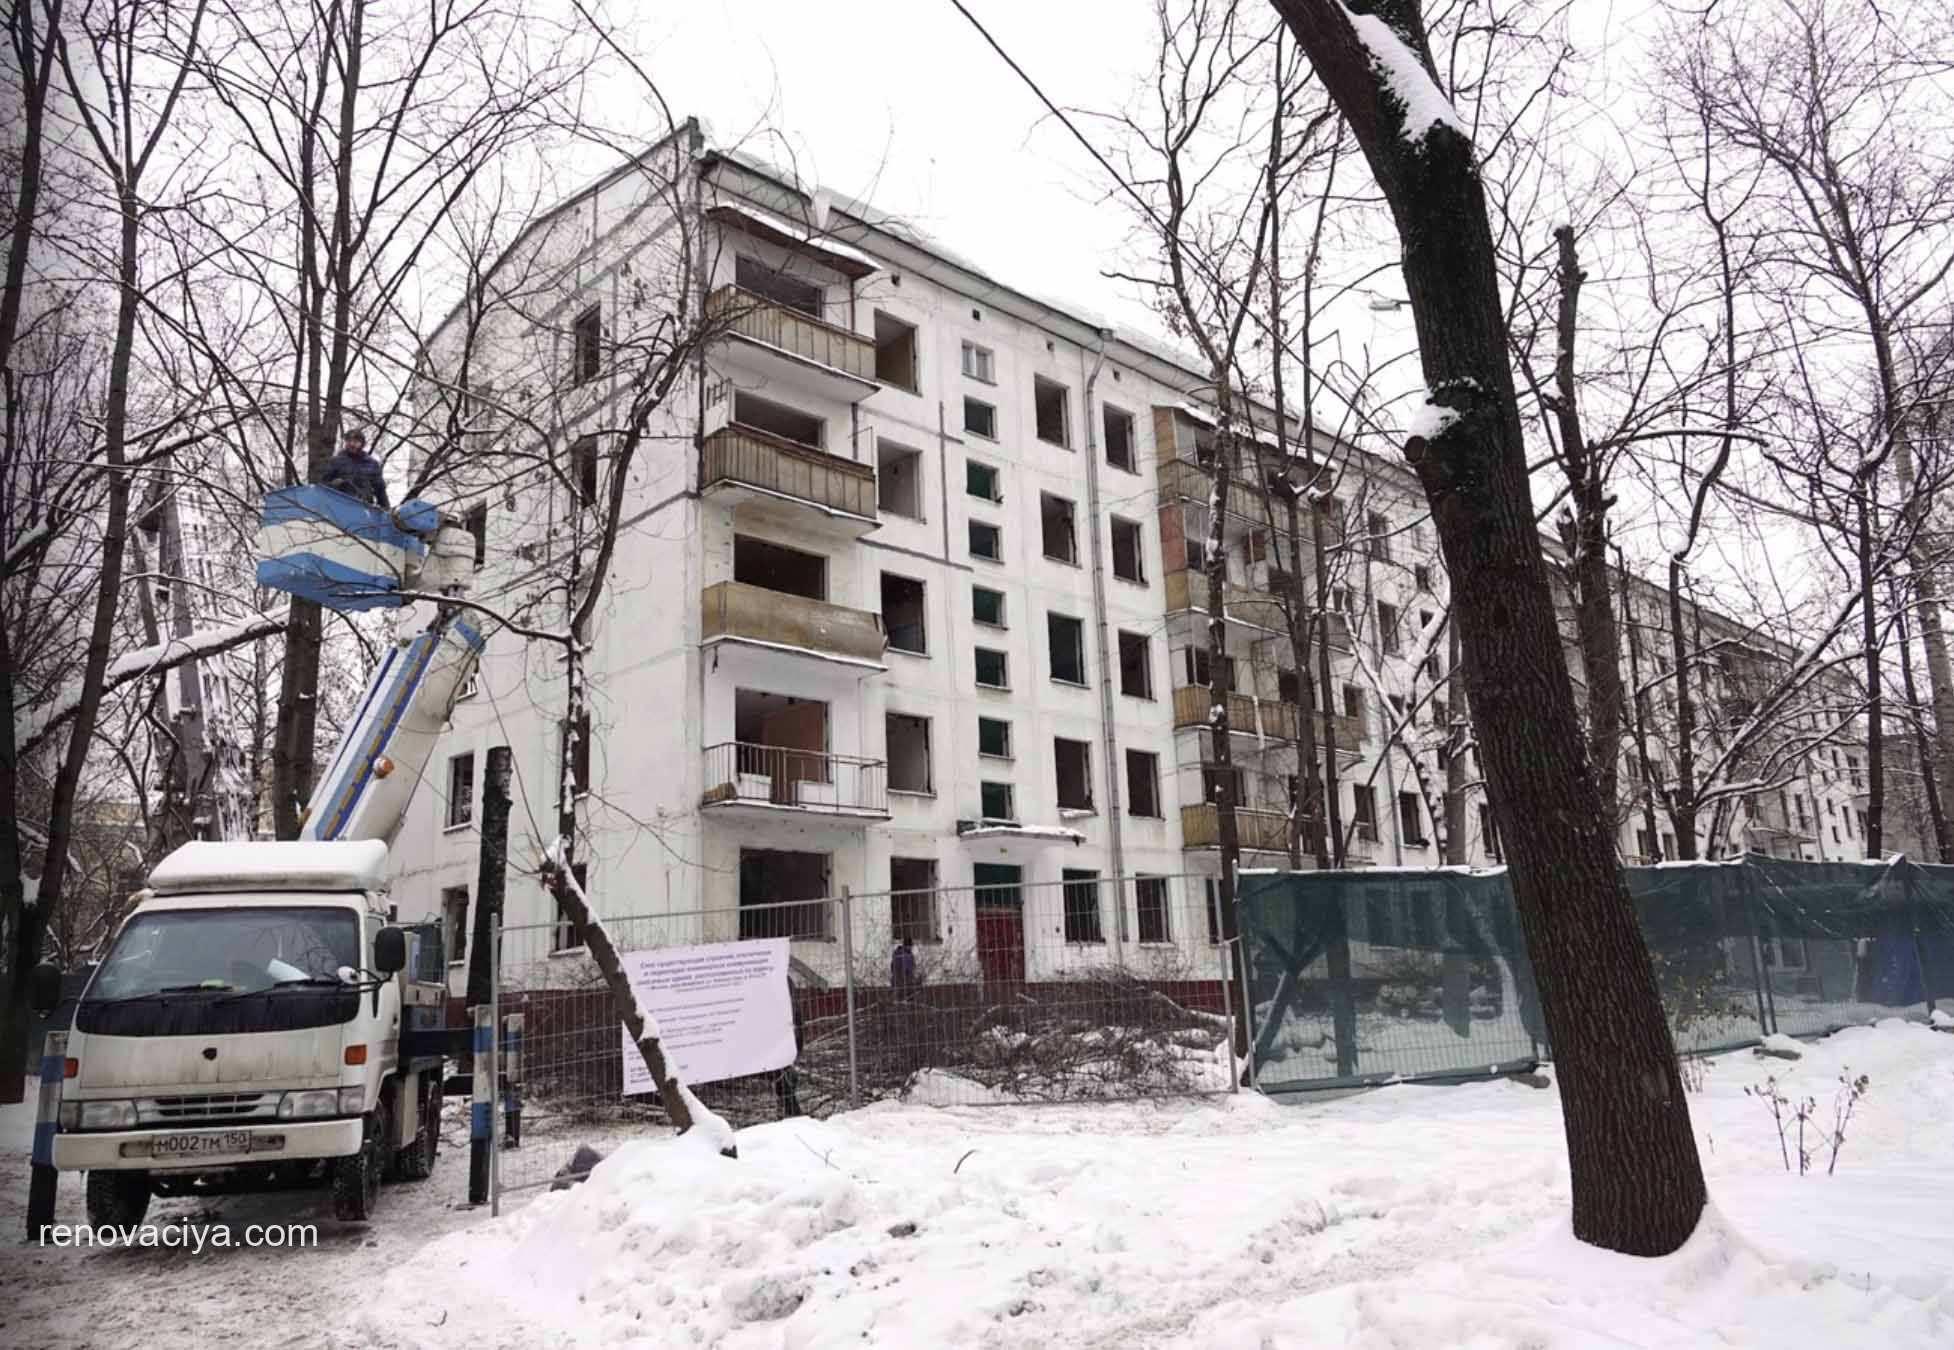 сносят четвертую пятиэтажку по программе реновации